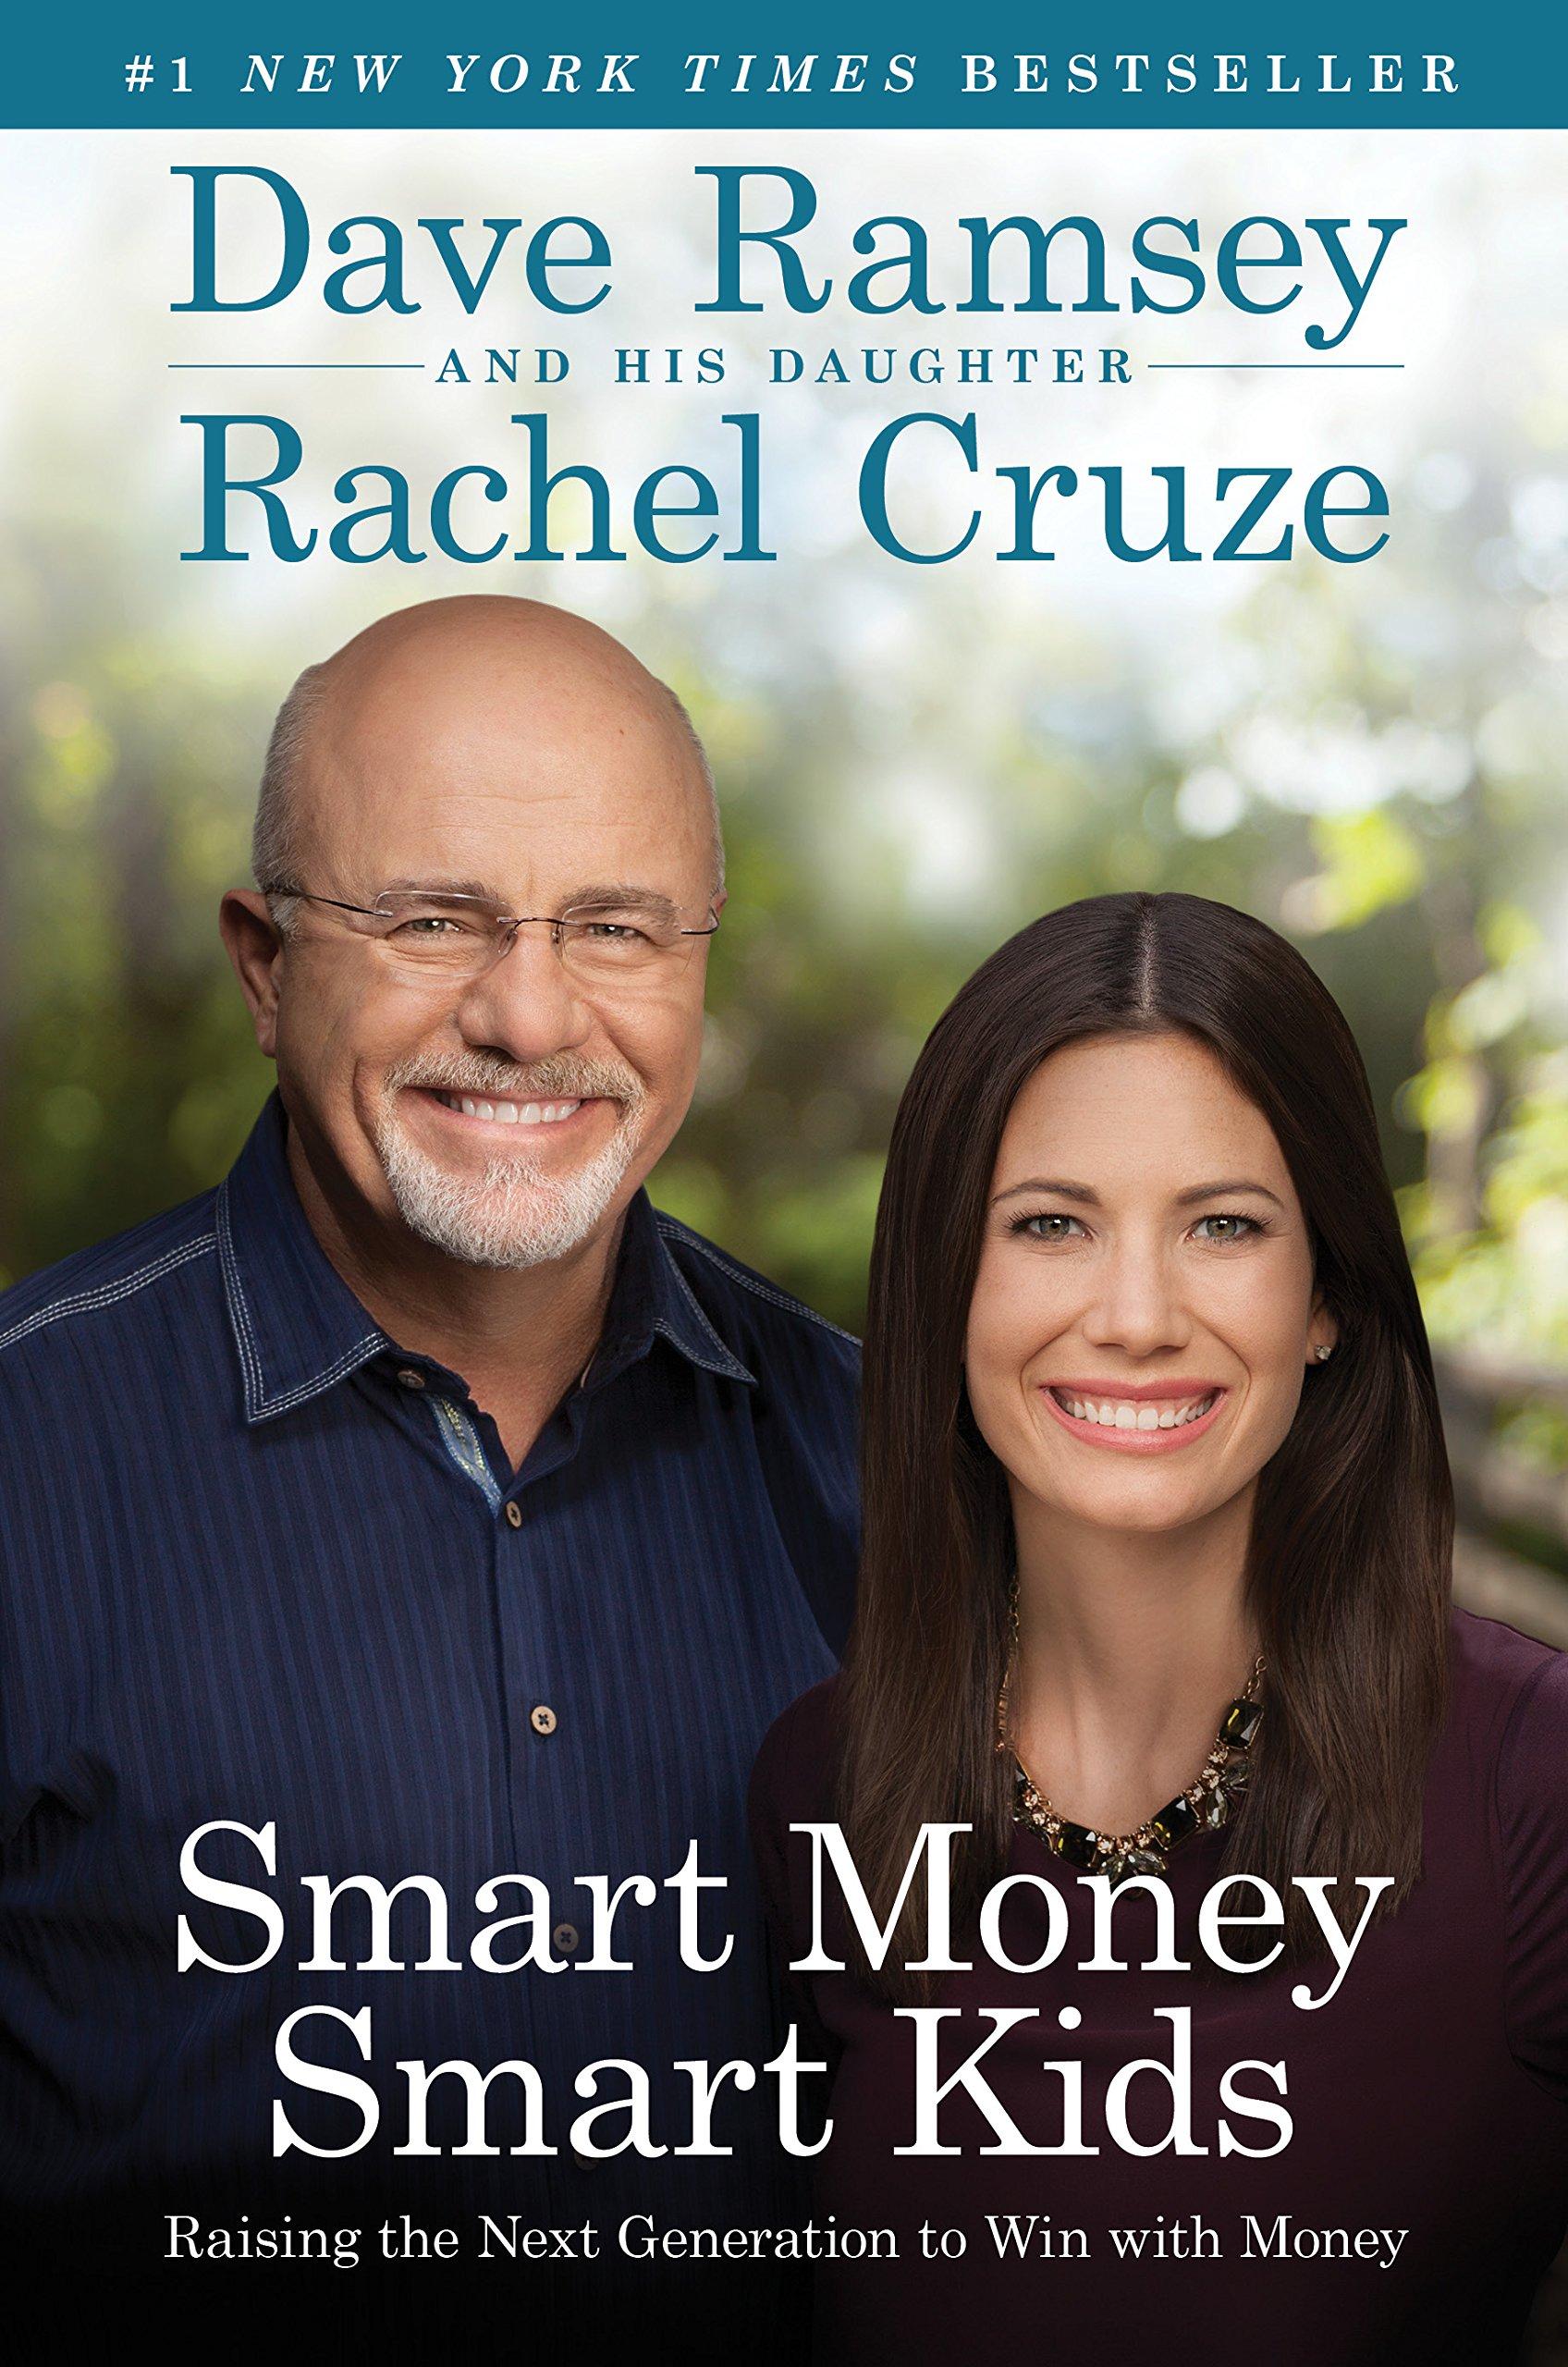 Smart Money Kids Raising Generation product image